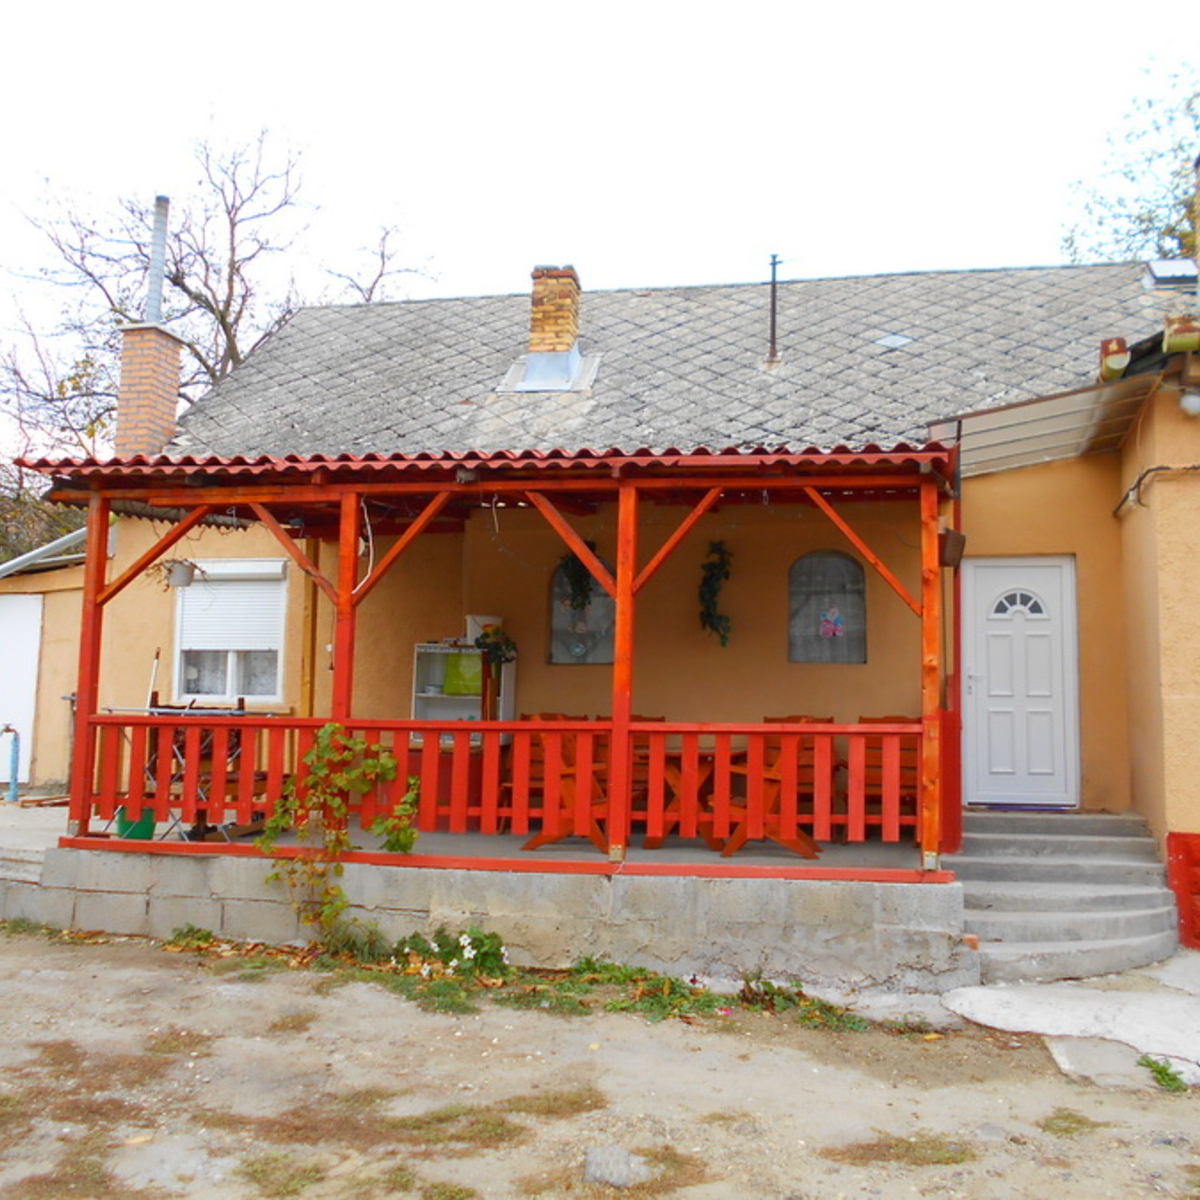 Eladó  családi ház (Valkó, Kossuth utca) 14,49 M  Ft